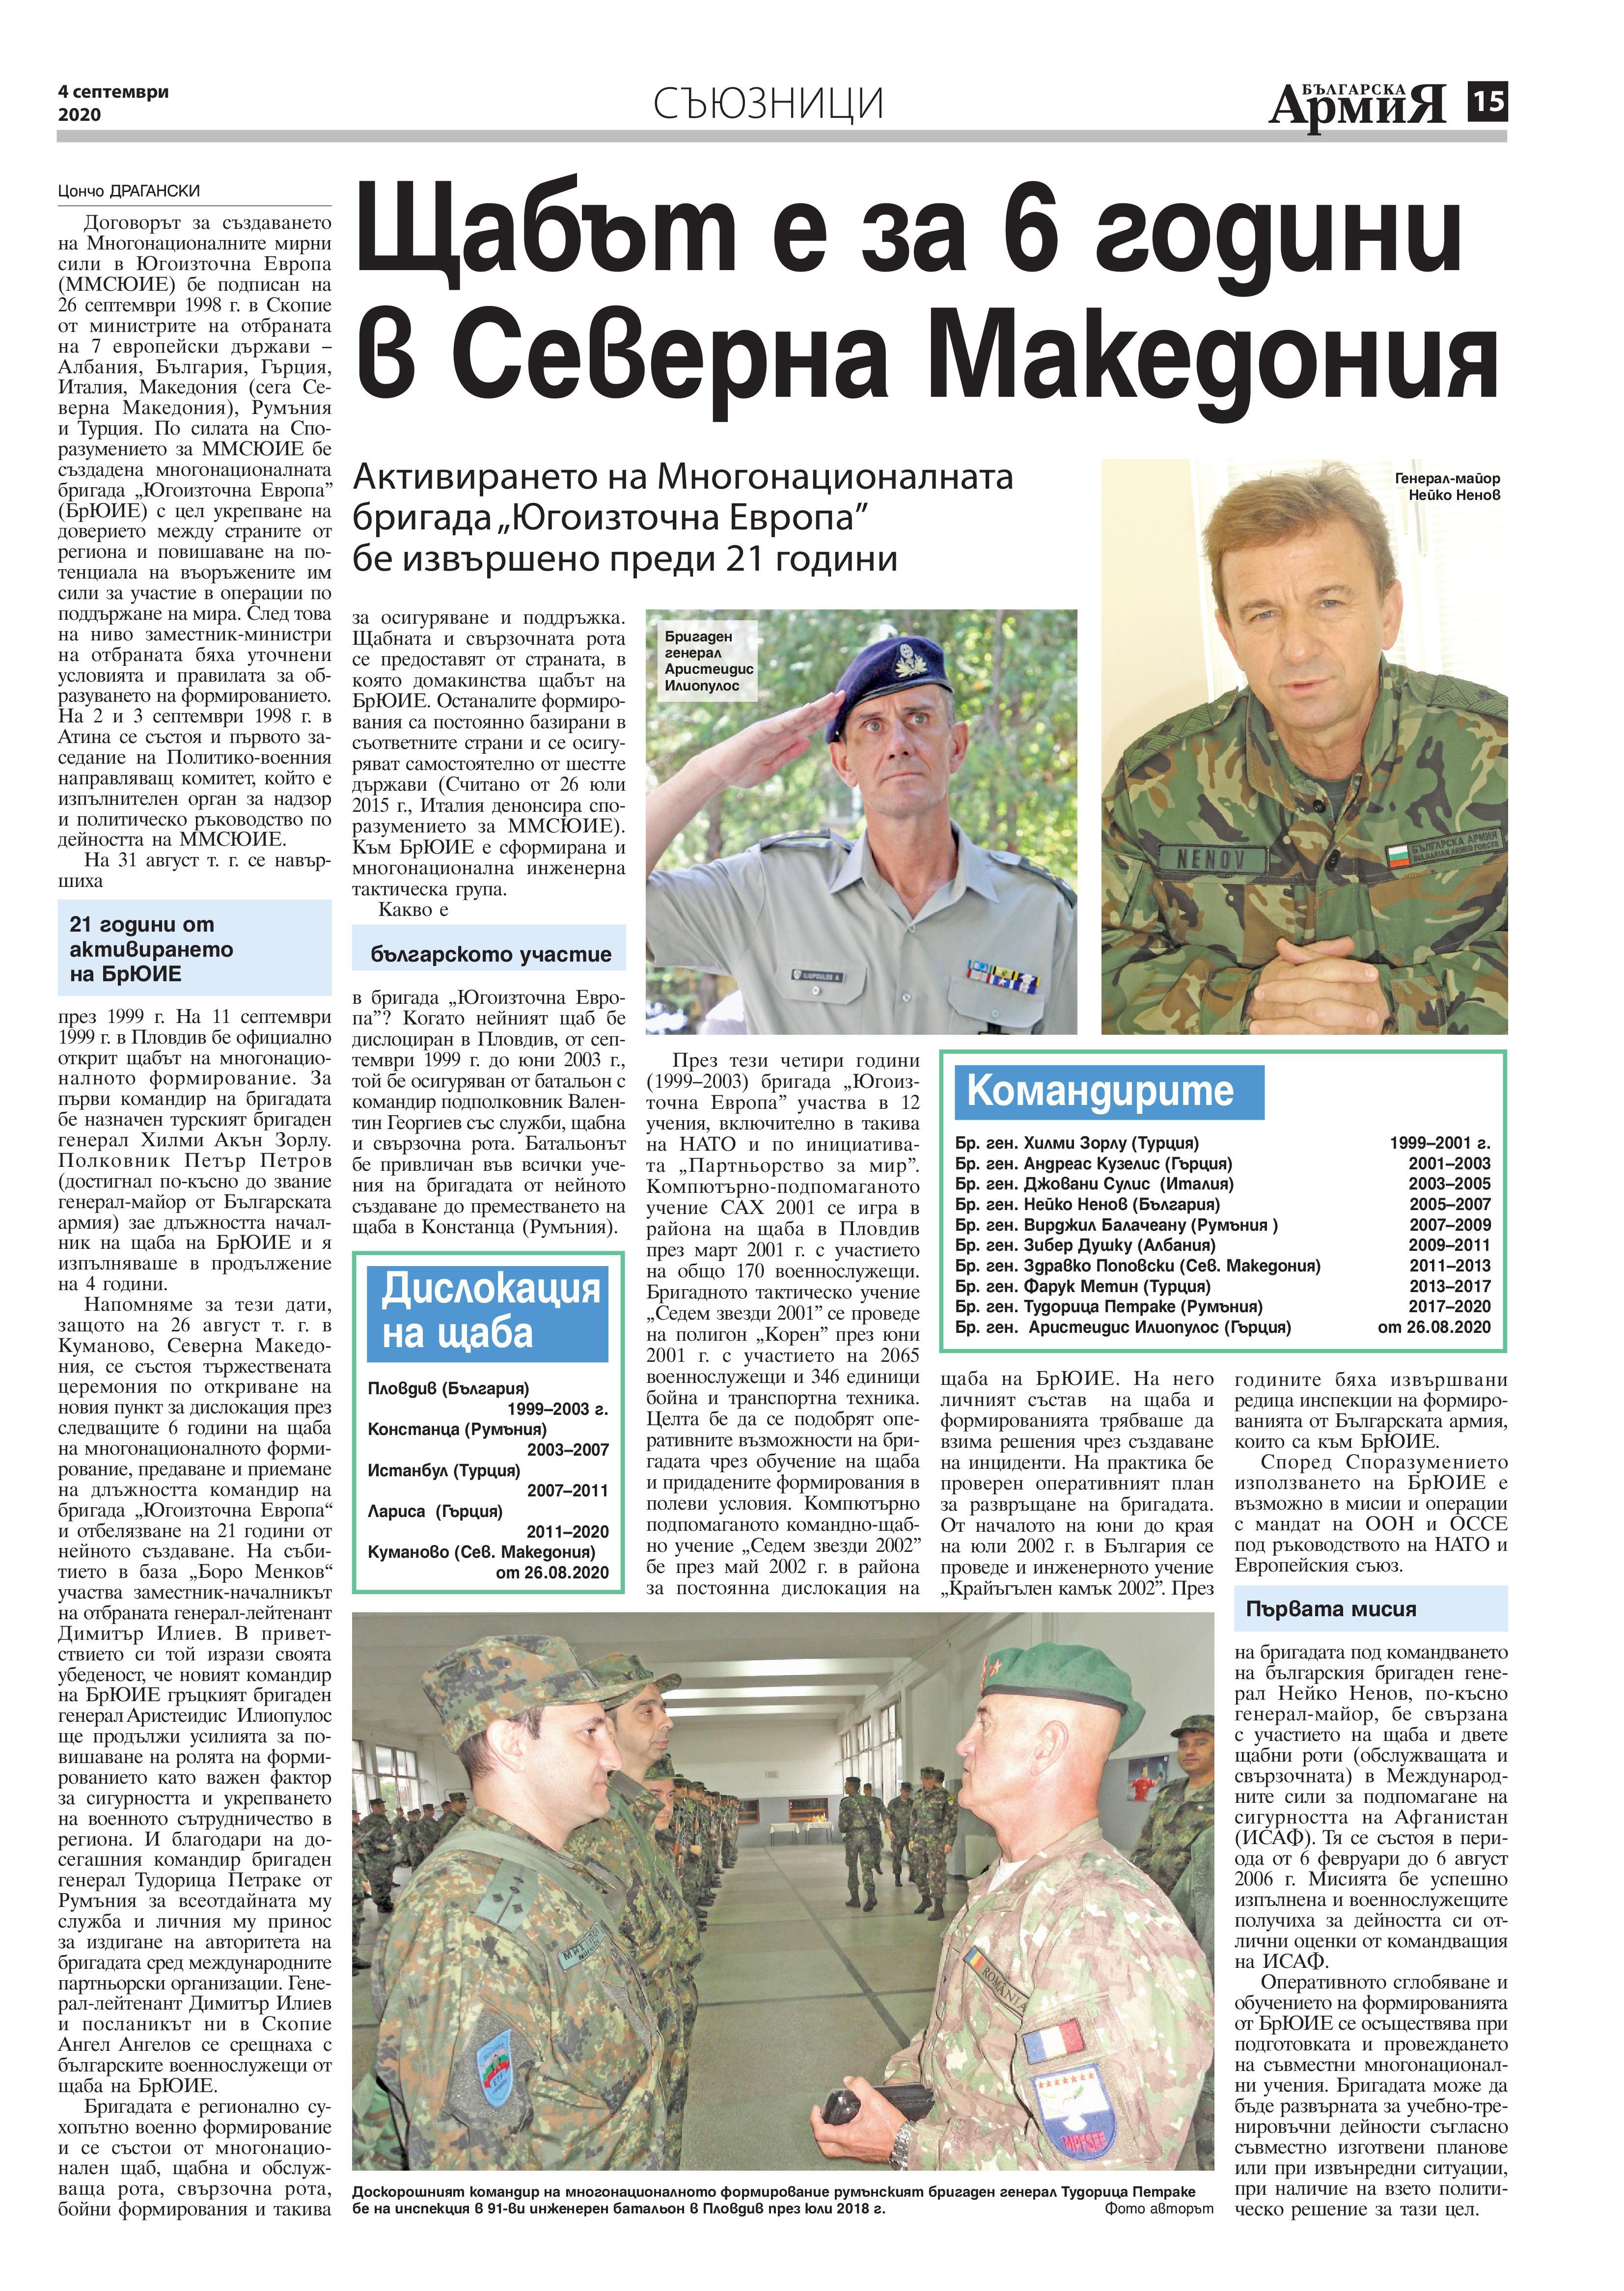 https://www.armymedia.bg/wp-content/uploads/2015/06/15-39.jpg